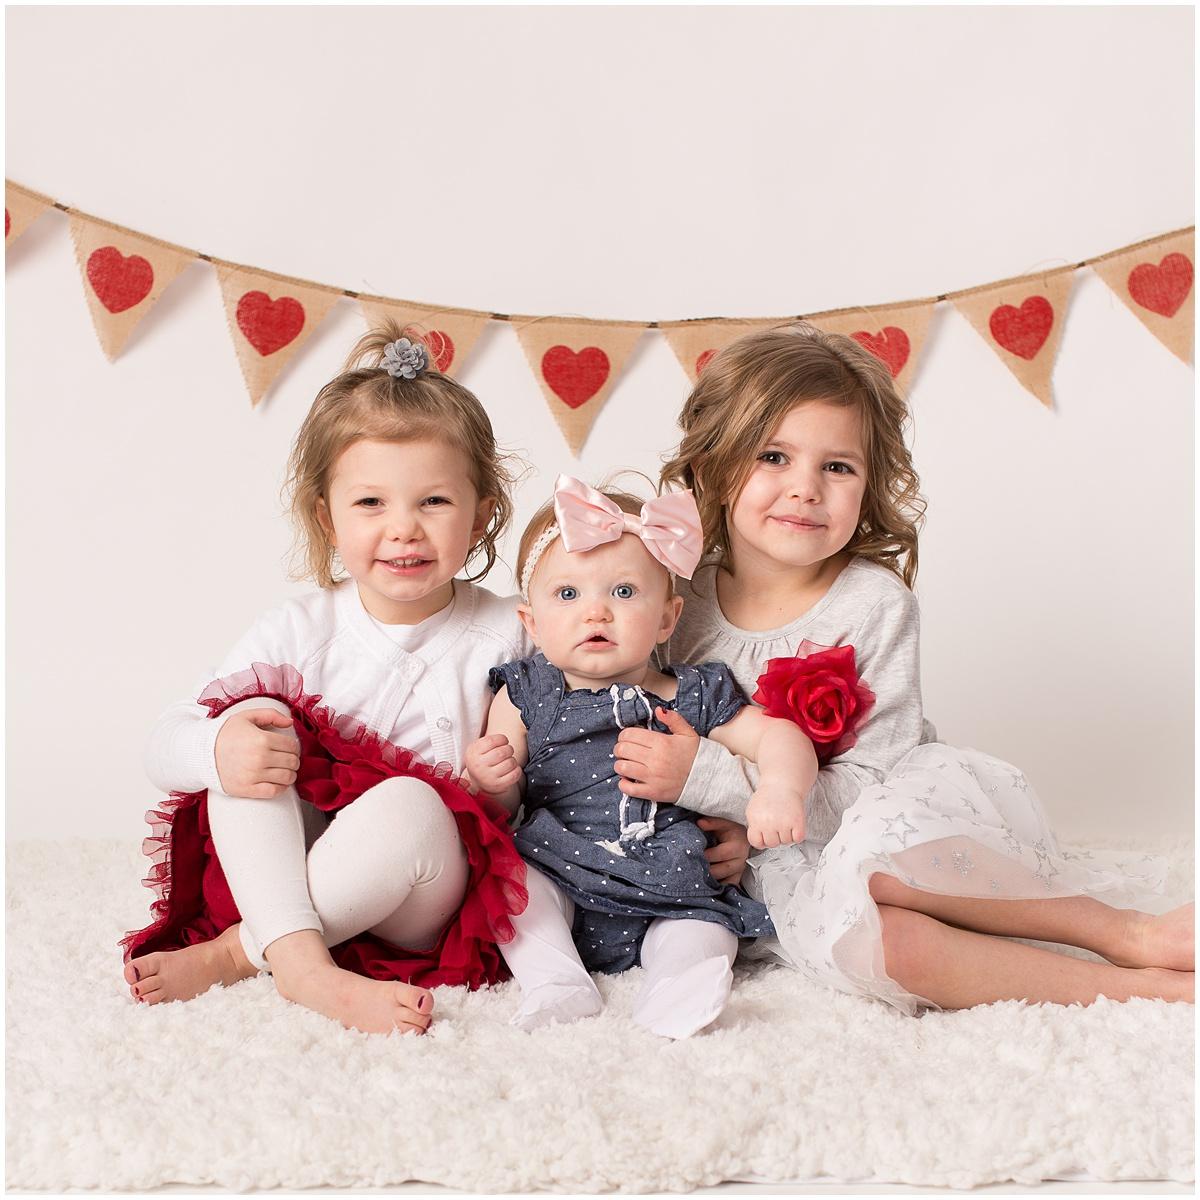 Child and Baby Studio Photography_Boise Idaho_ Meridian Idaho_Eagle Idaho_Leah Southwick Photography_0002.jpg